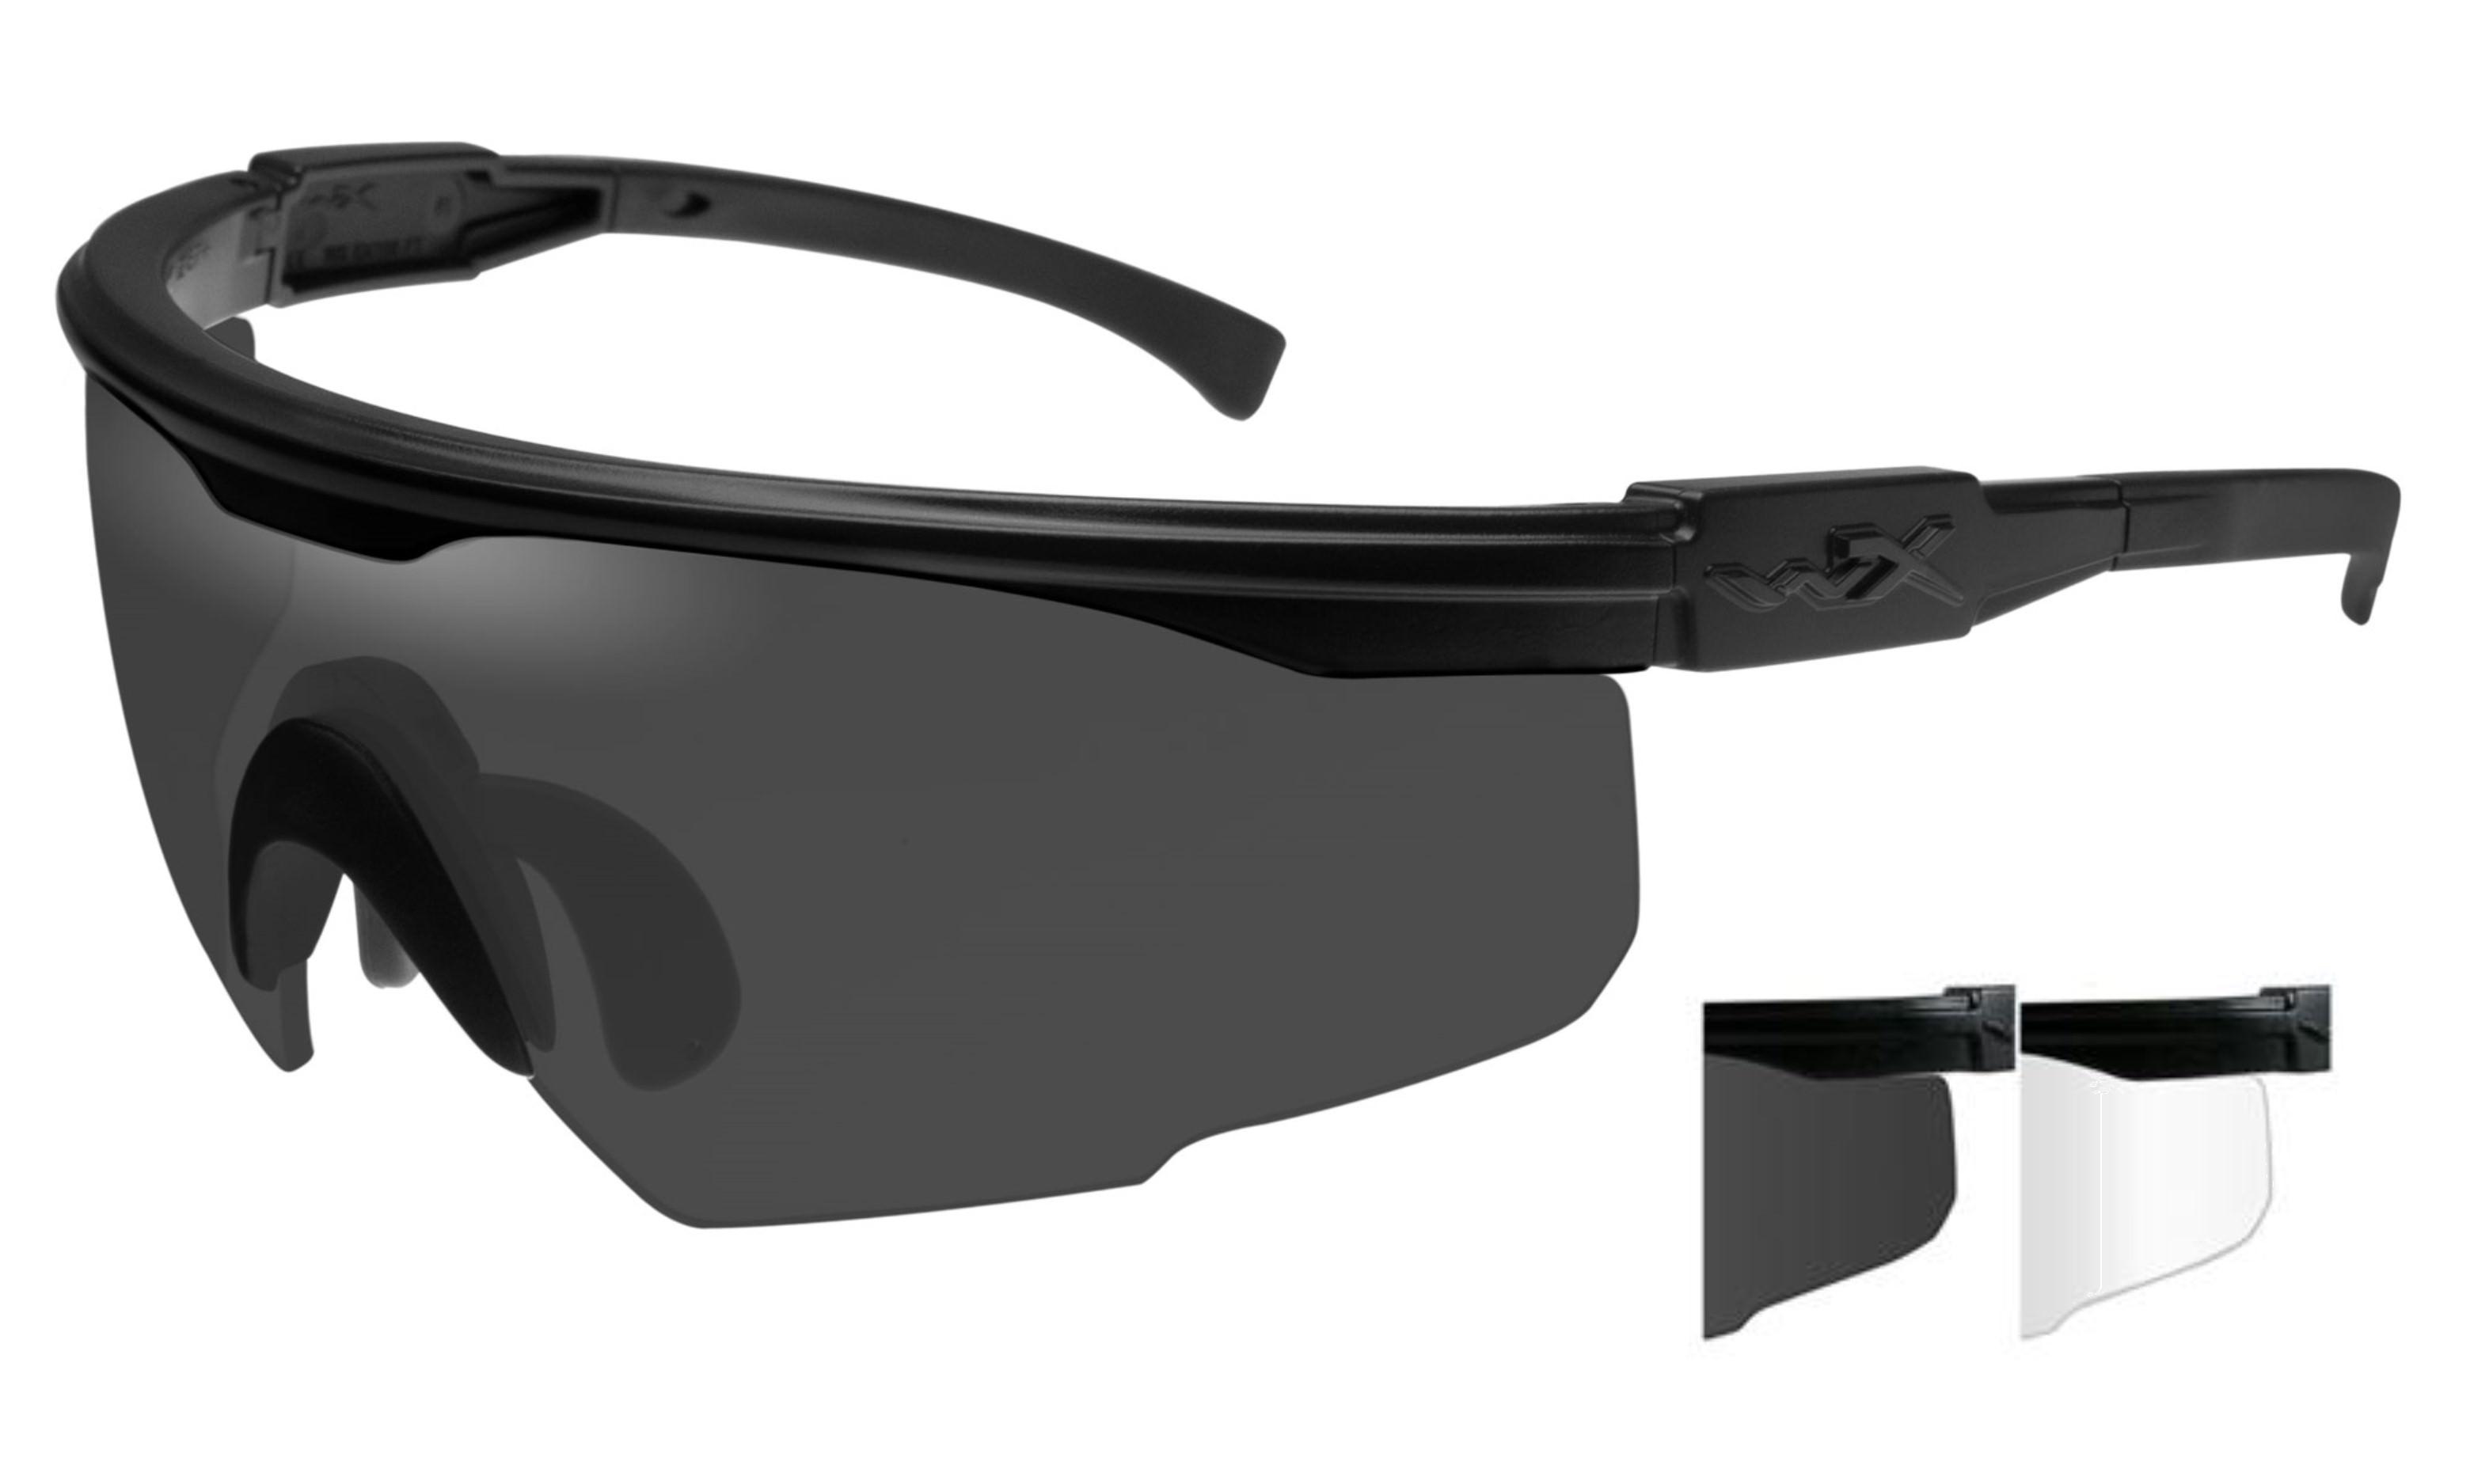 3f5941fea770 Wiley-X PT-1Polarized Lenses - Smoke Grey,Clear Wiley X